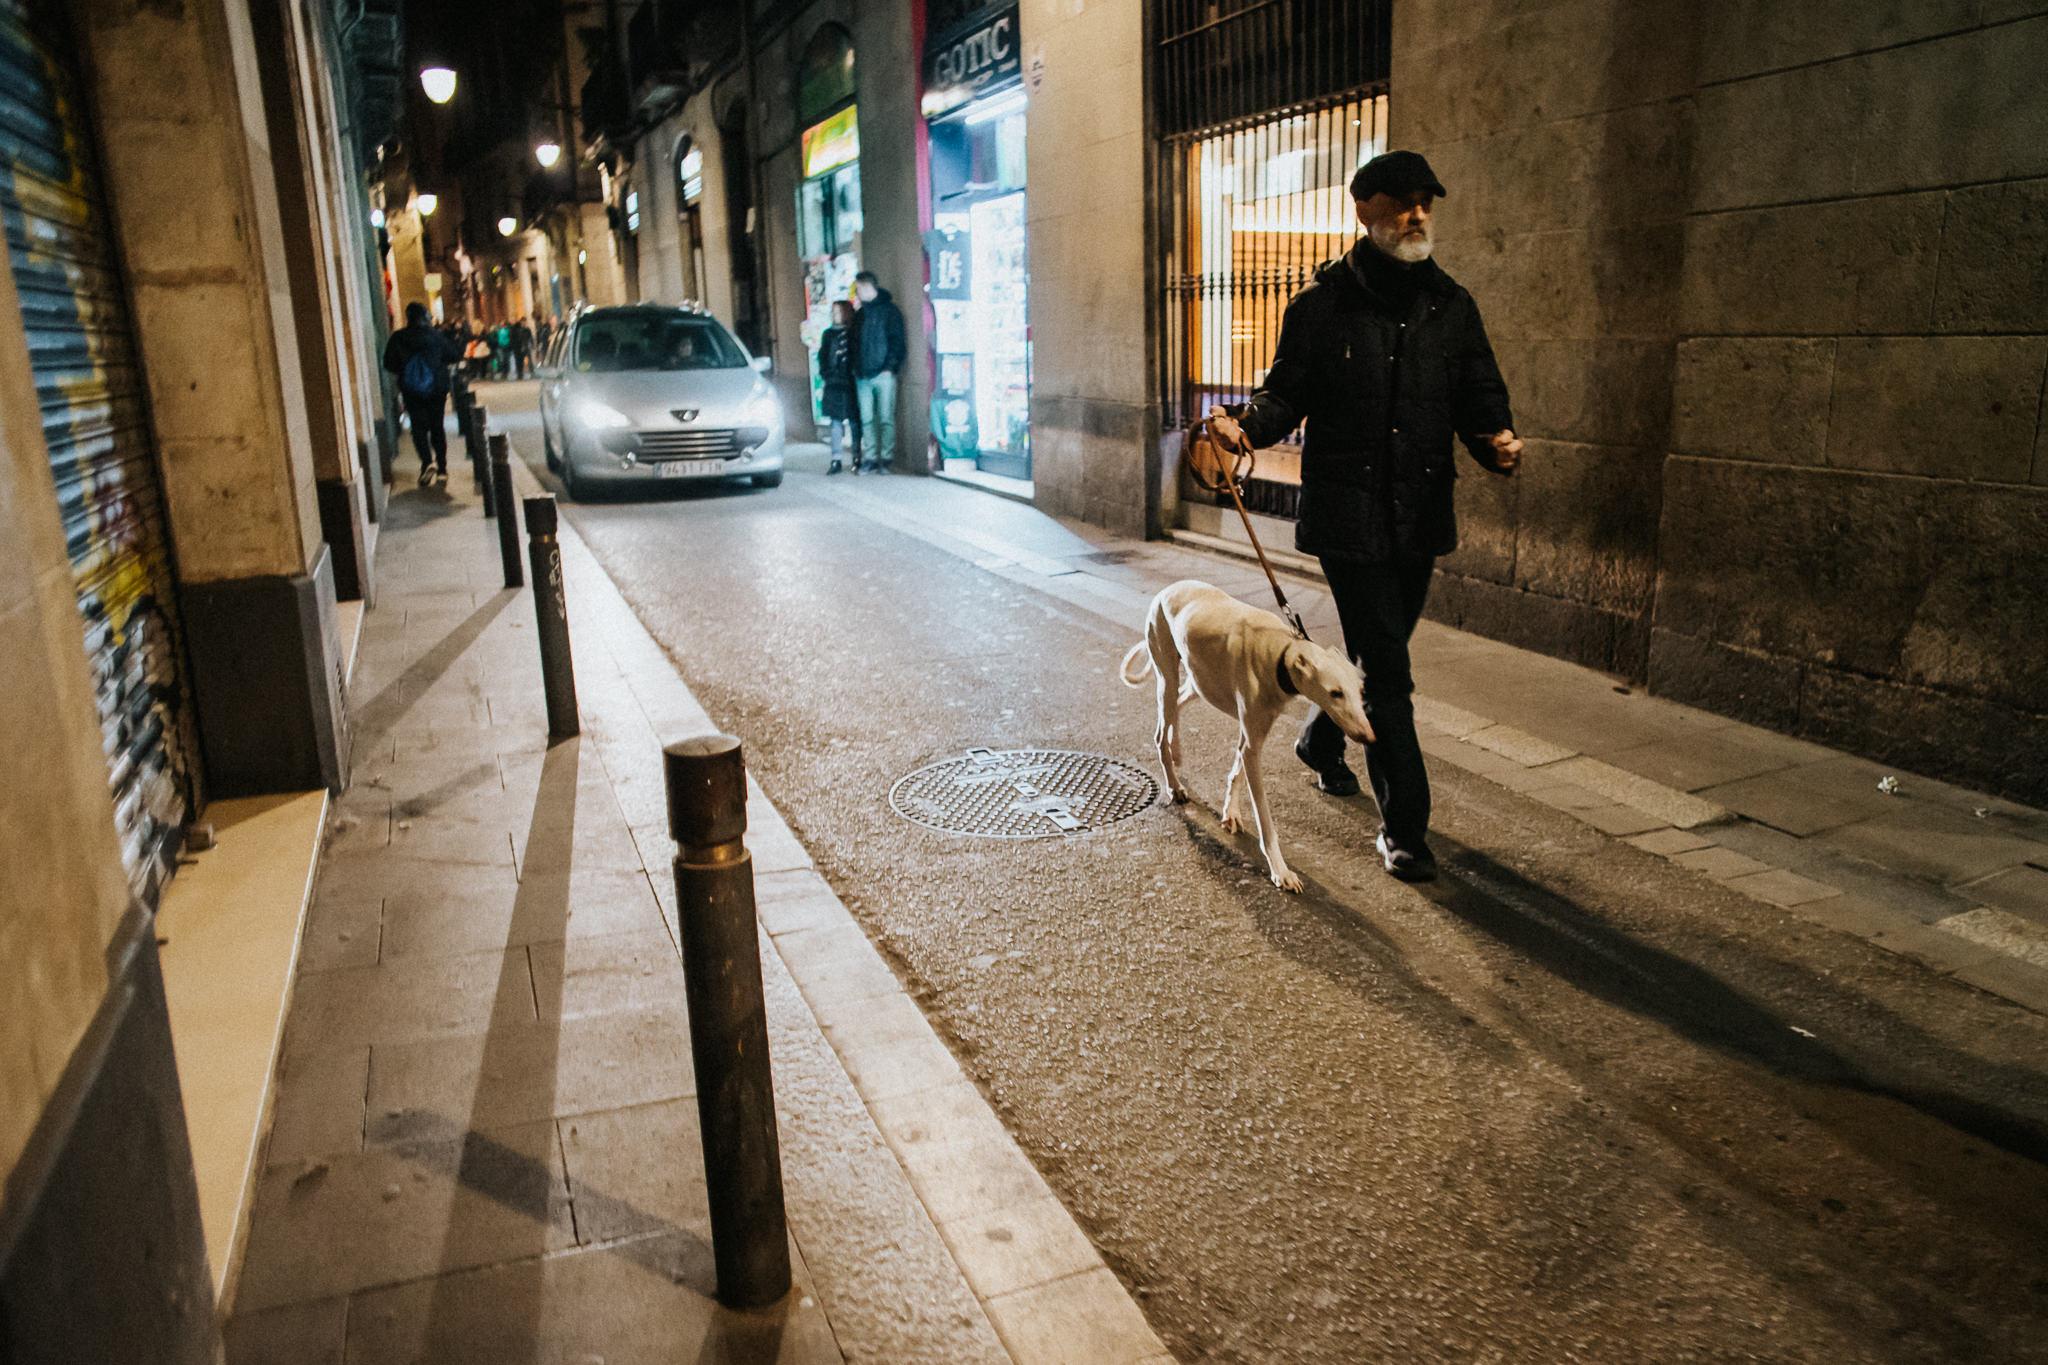 Barcelona-destination-photographer-alfred-tang-43.jpg